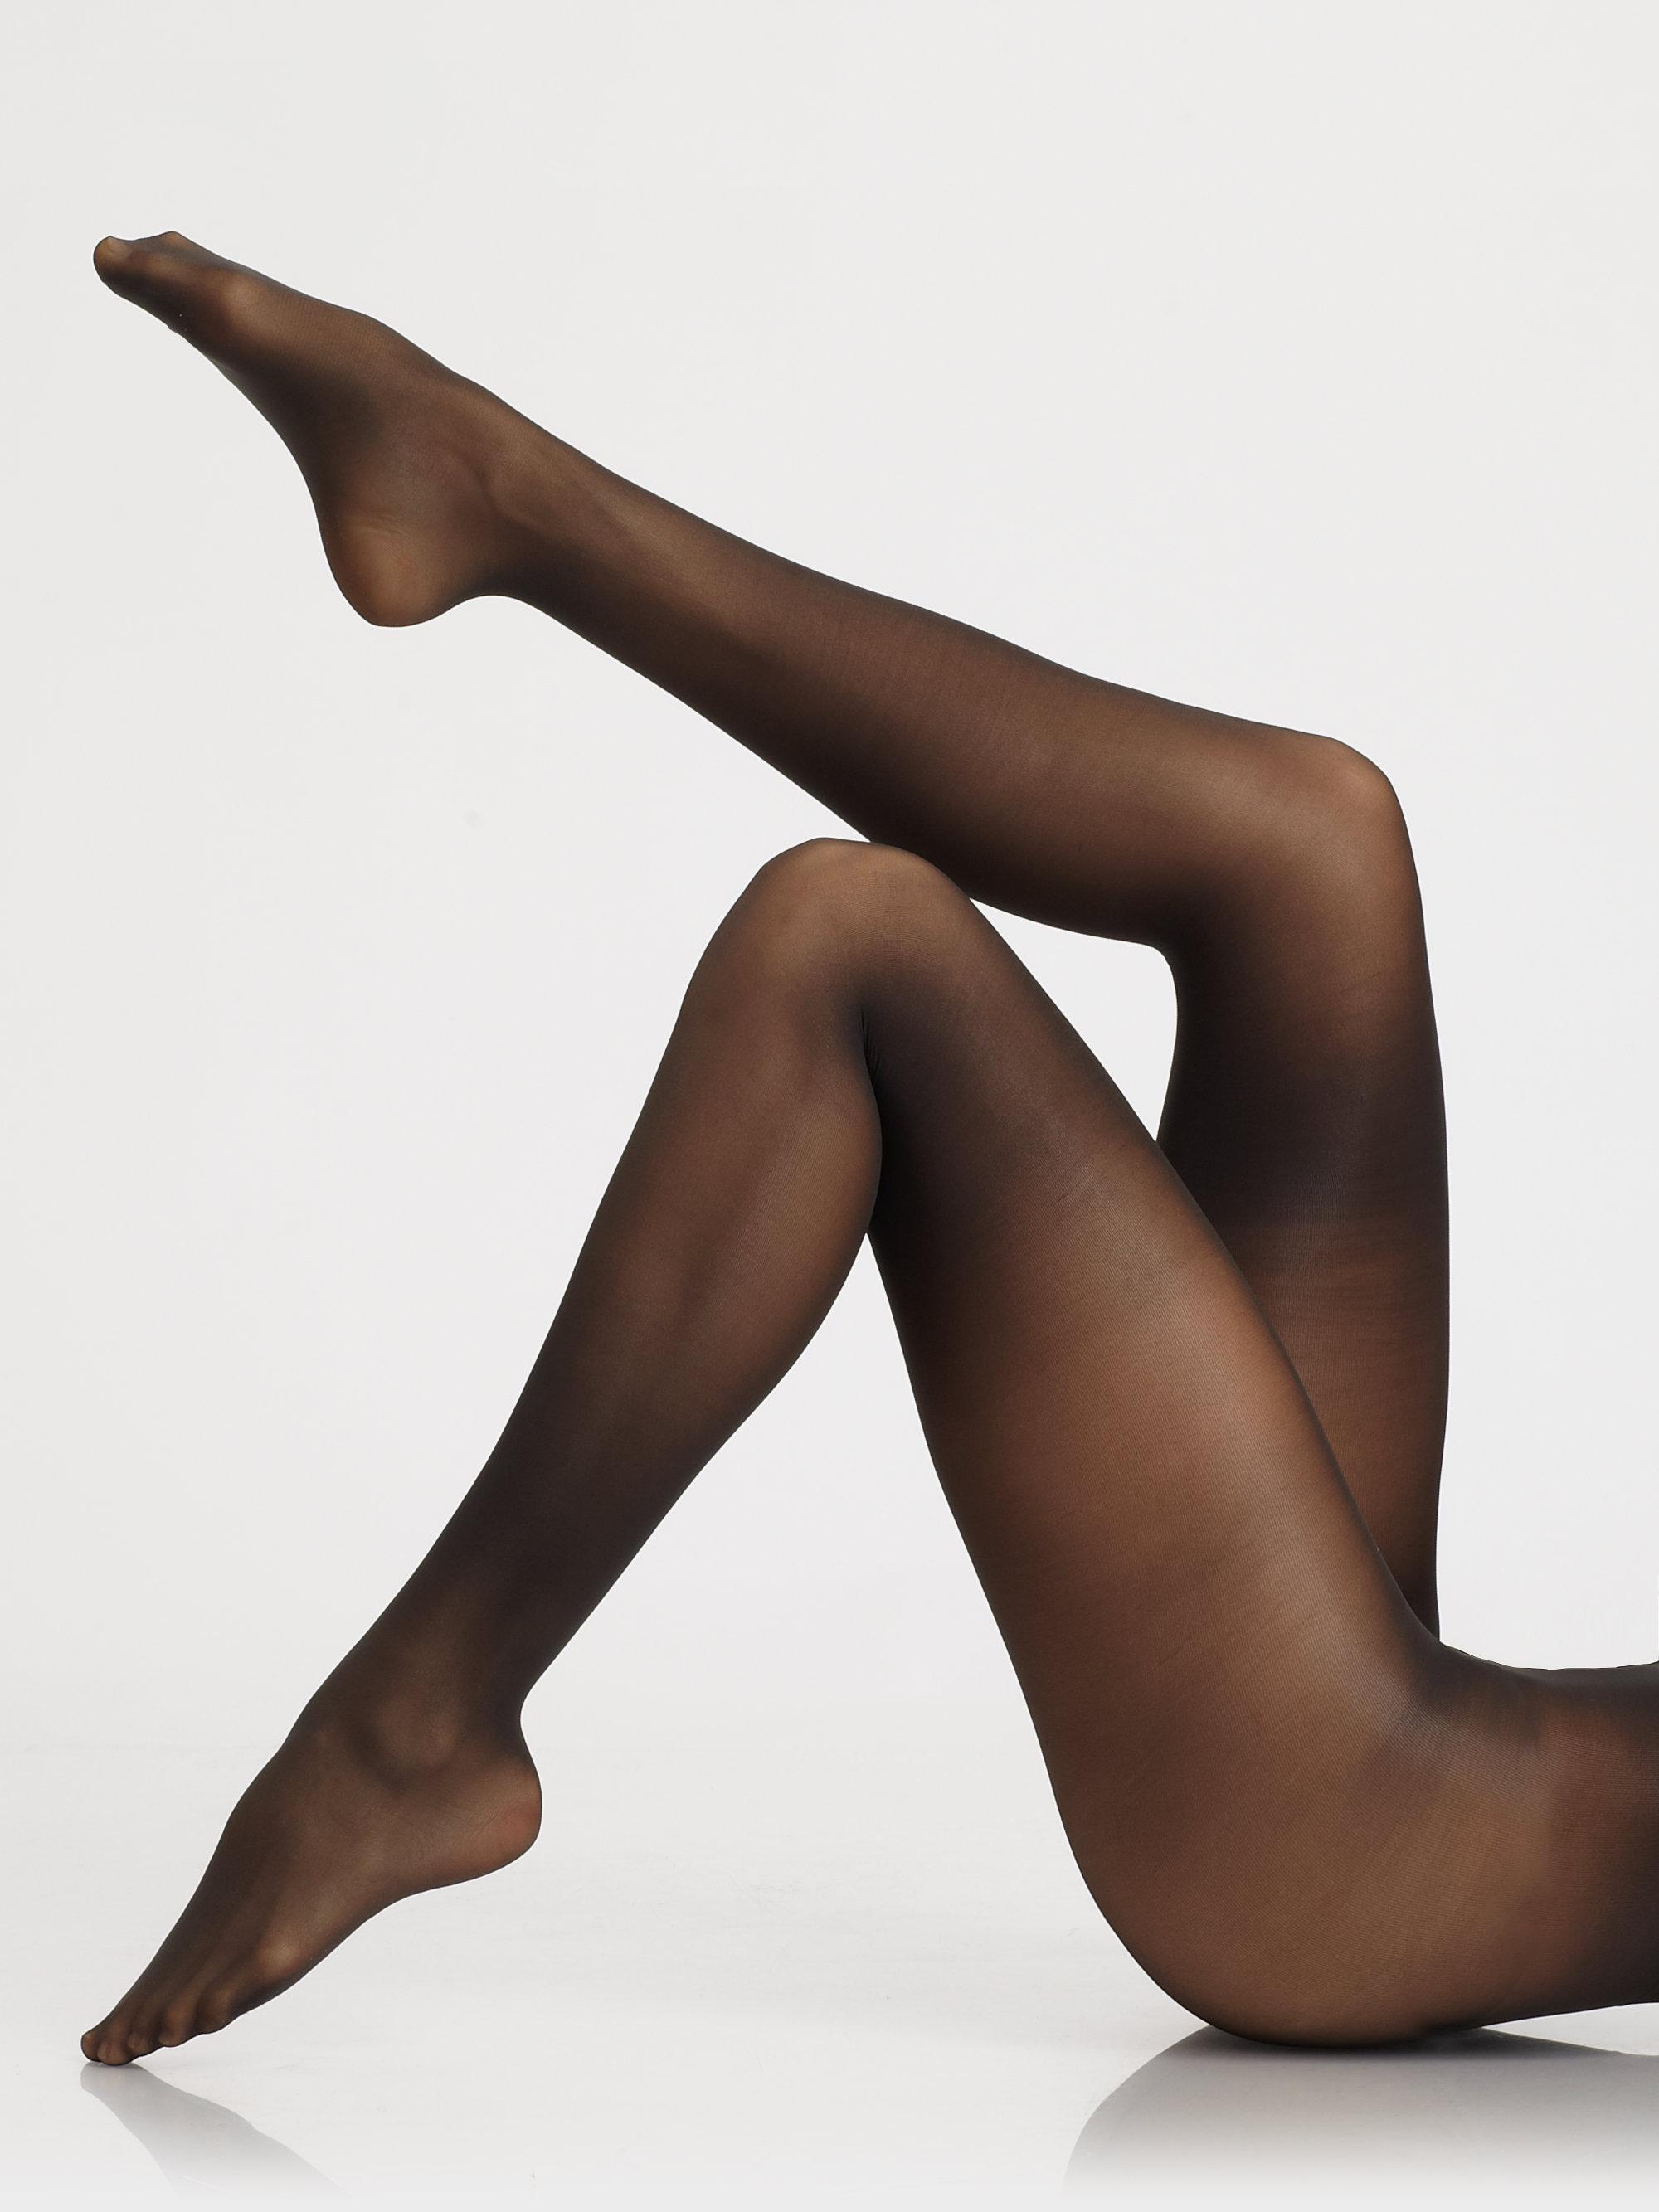 videos of naked hot girls